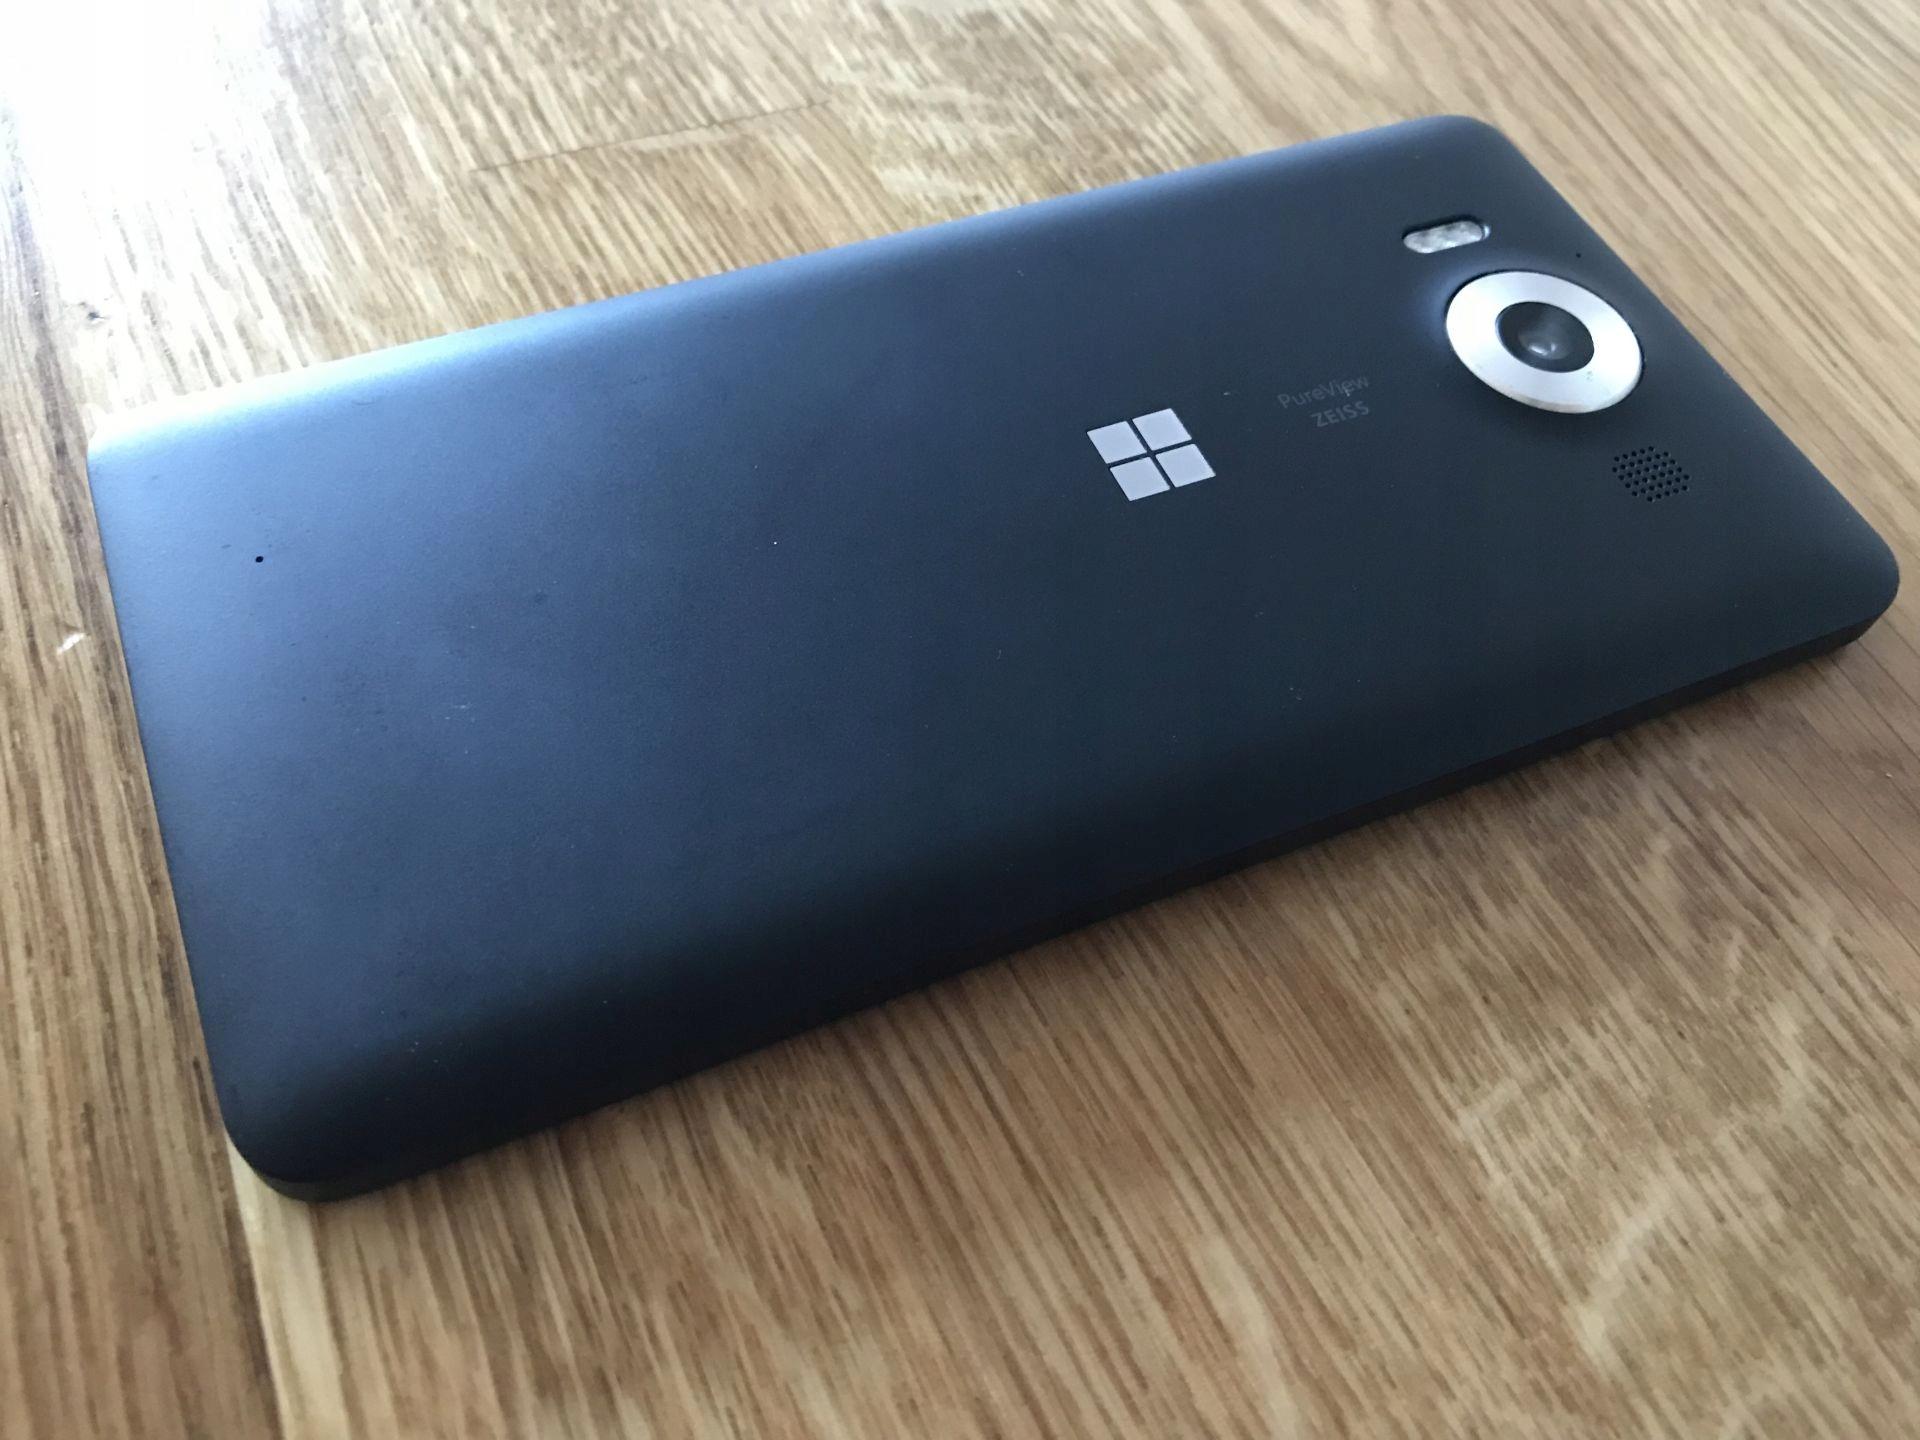 Microsoft Lumia 950 Dual Sim Media Markt Polska 5 7628573393